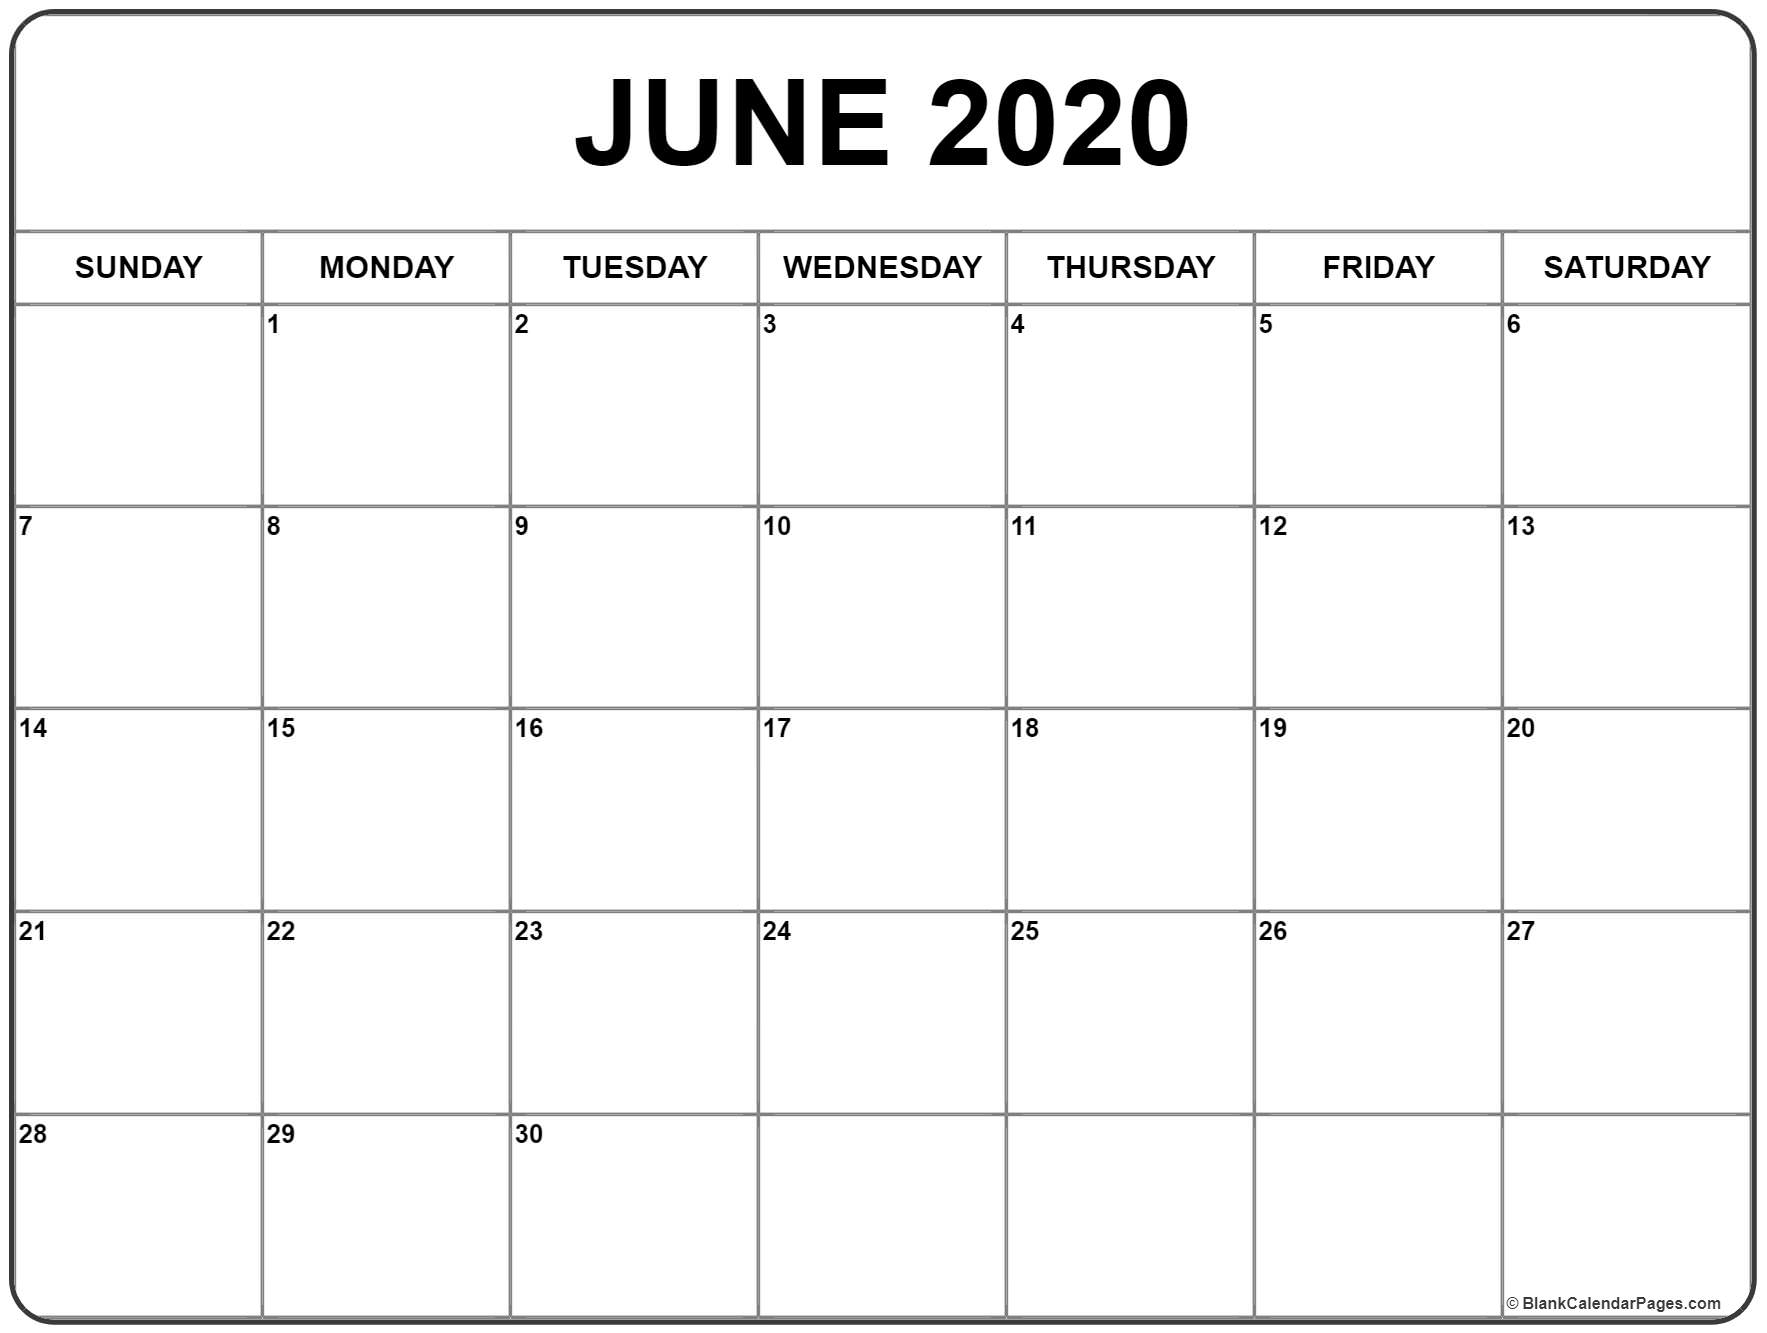 June 2020 Calendar | Free Printable Monthly Calendars inside Printable Calendars July 2019 To June 2020